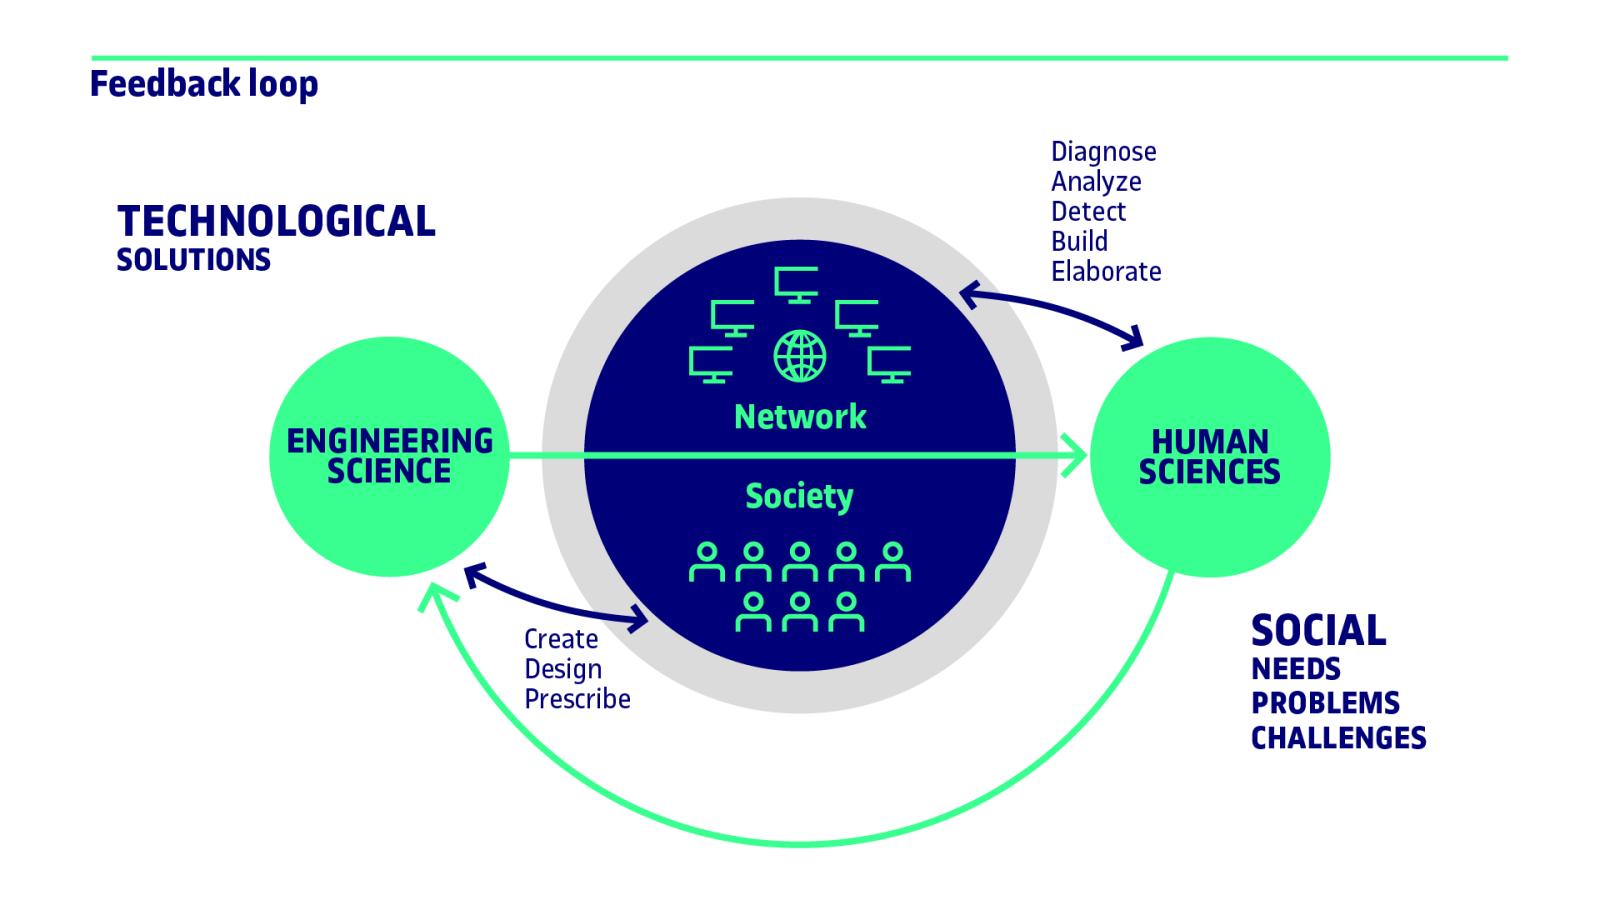 uoc-in3-research-feedback-loop-infografia-eng-l